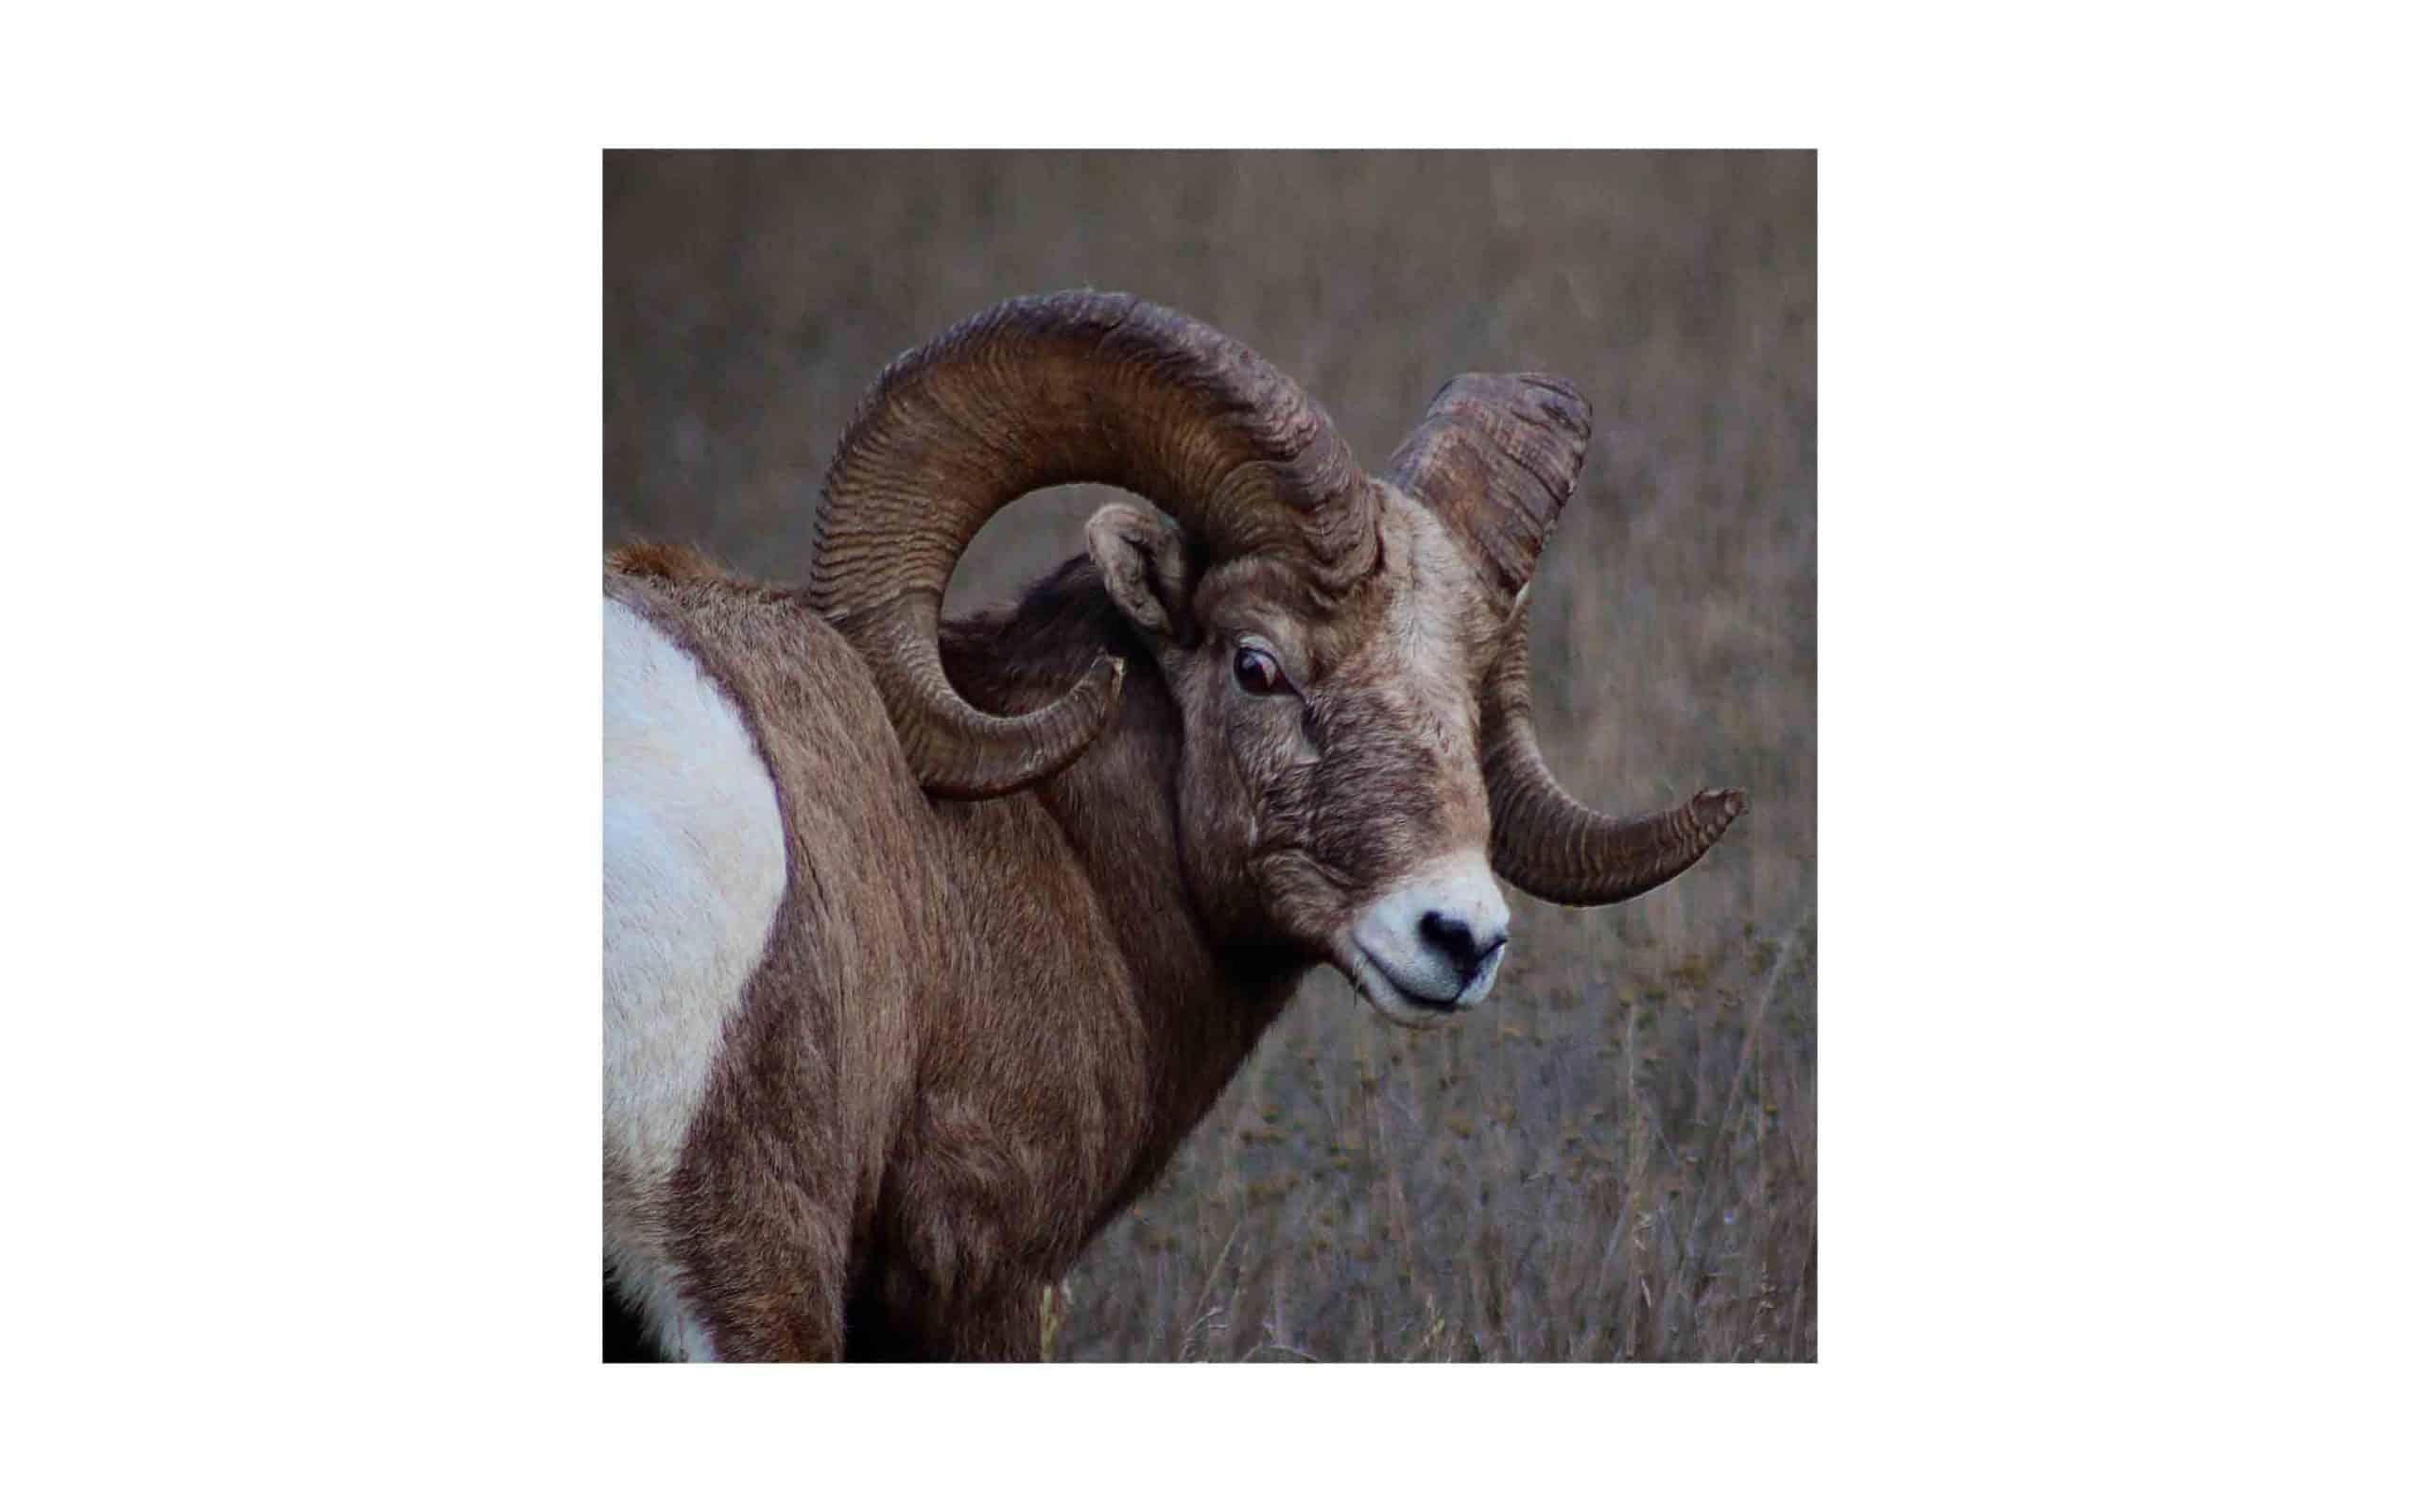 or-bighorn-sheep-2.jpg?mtime=20170811134642#asset:6285